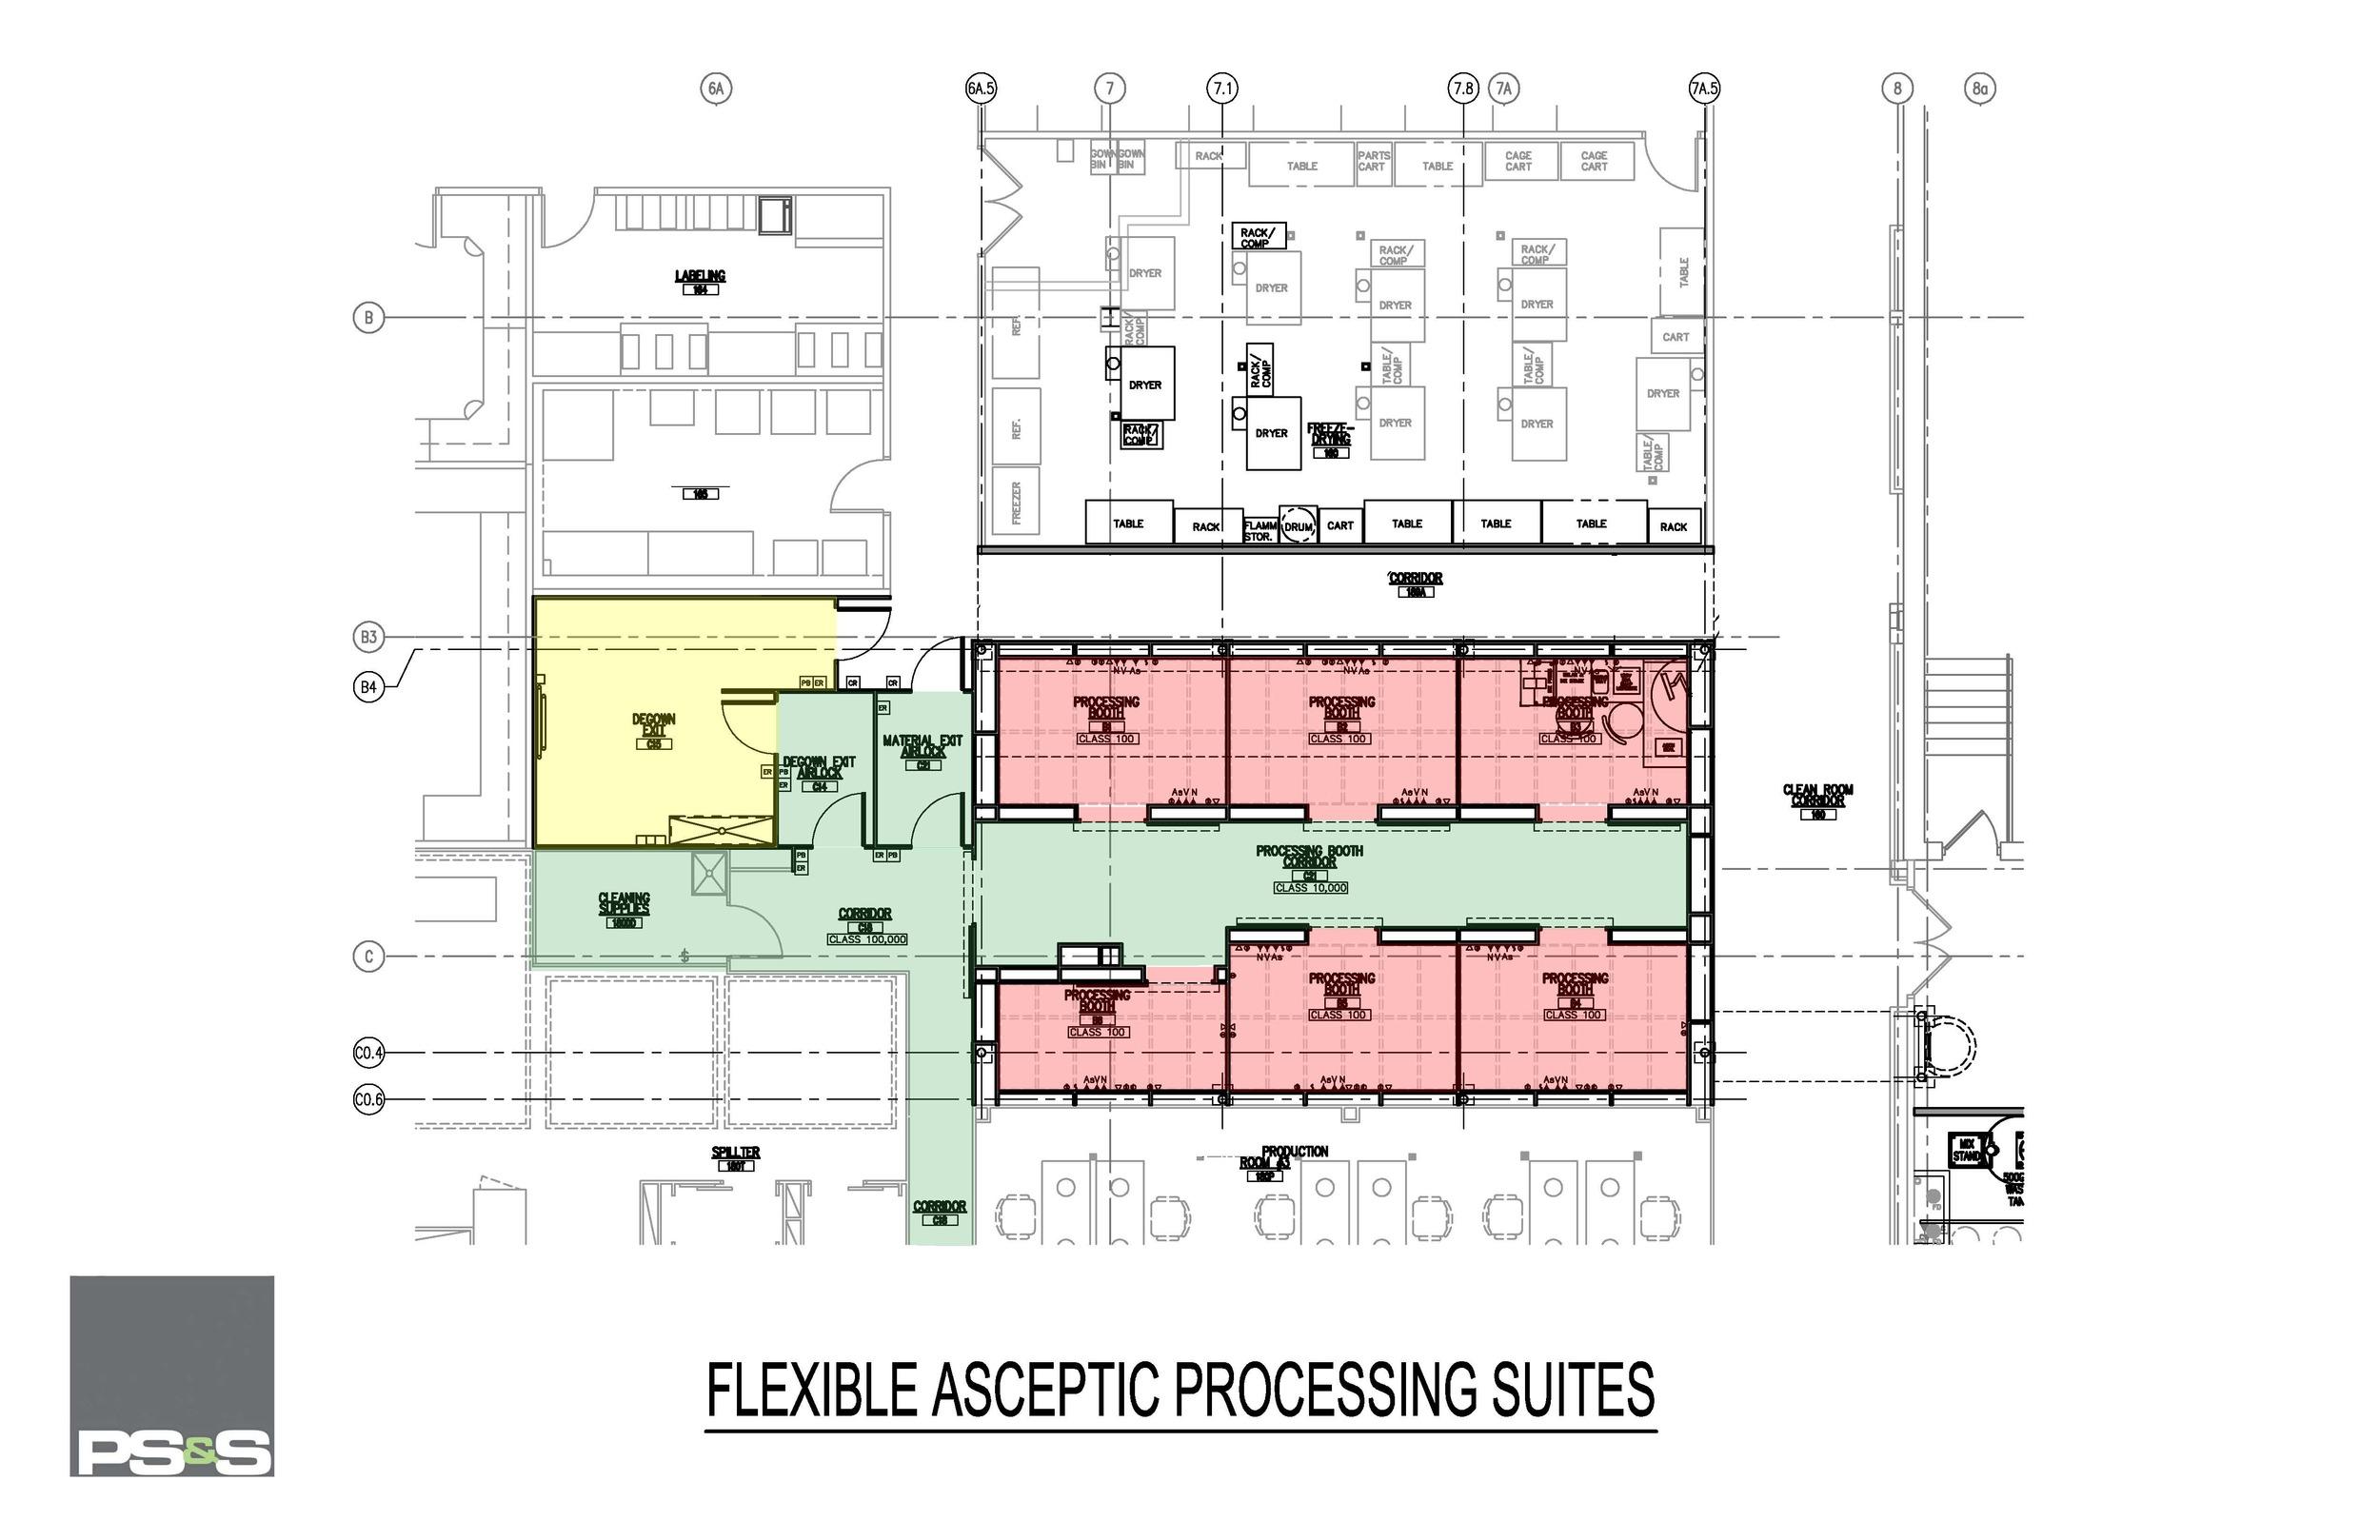 flexible_suites.jpg